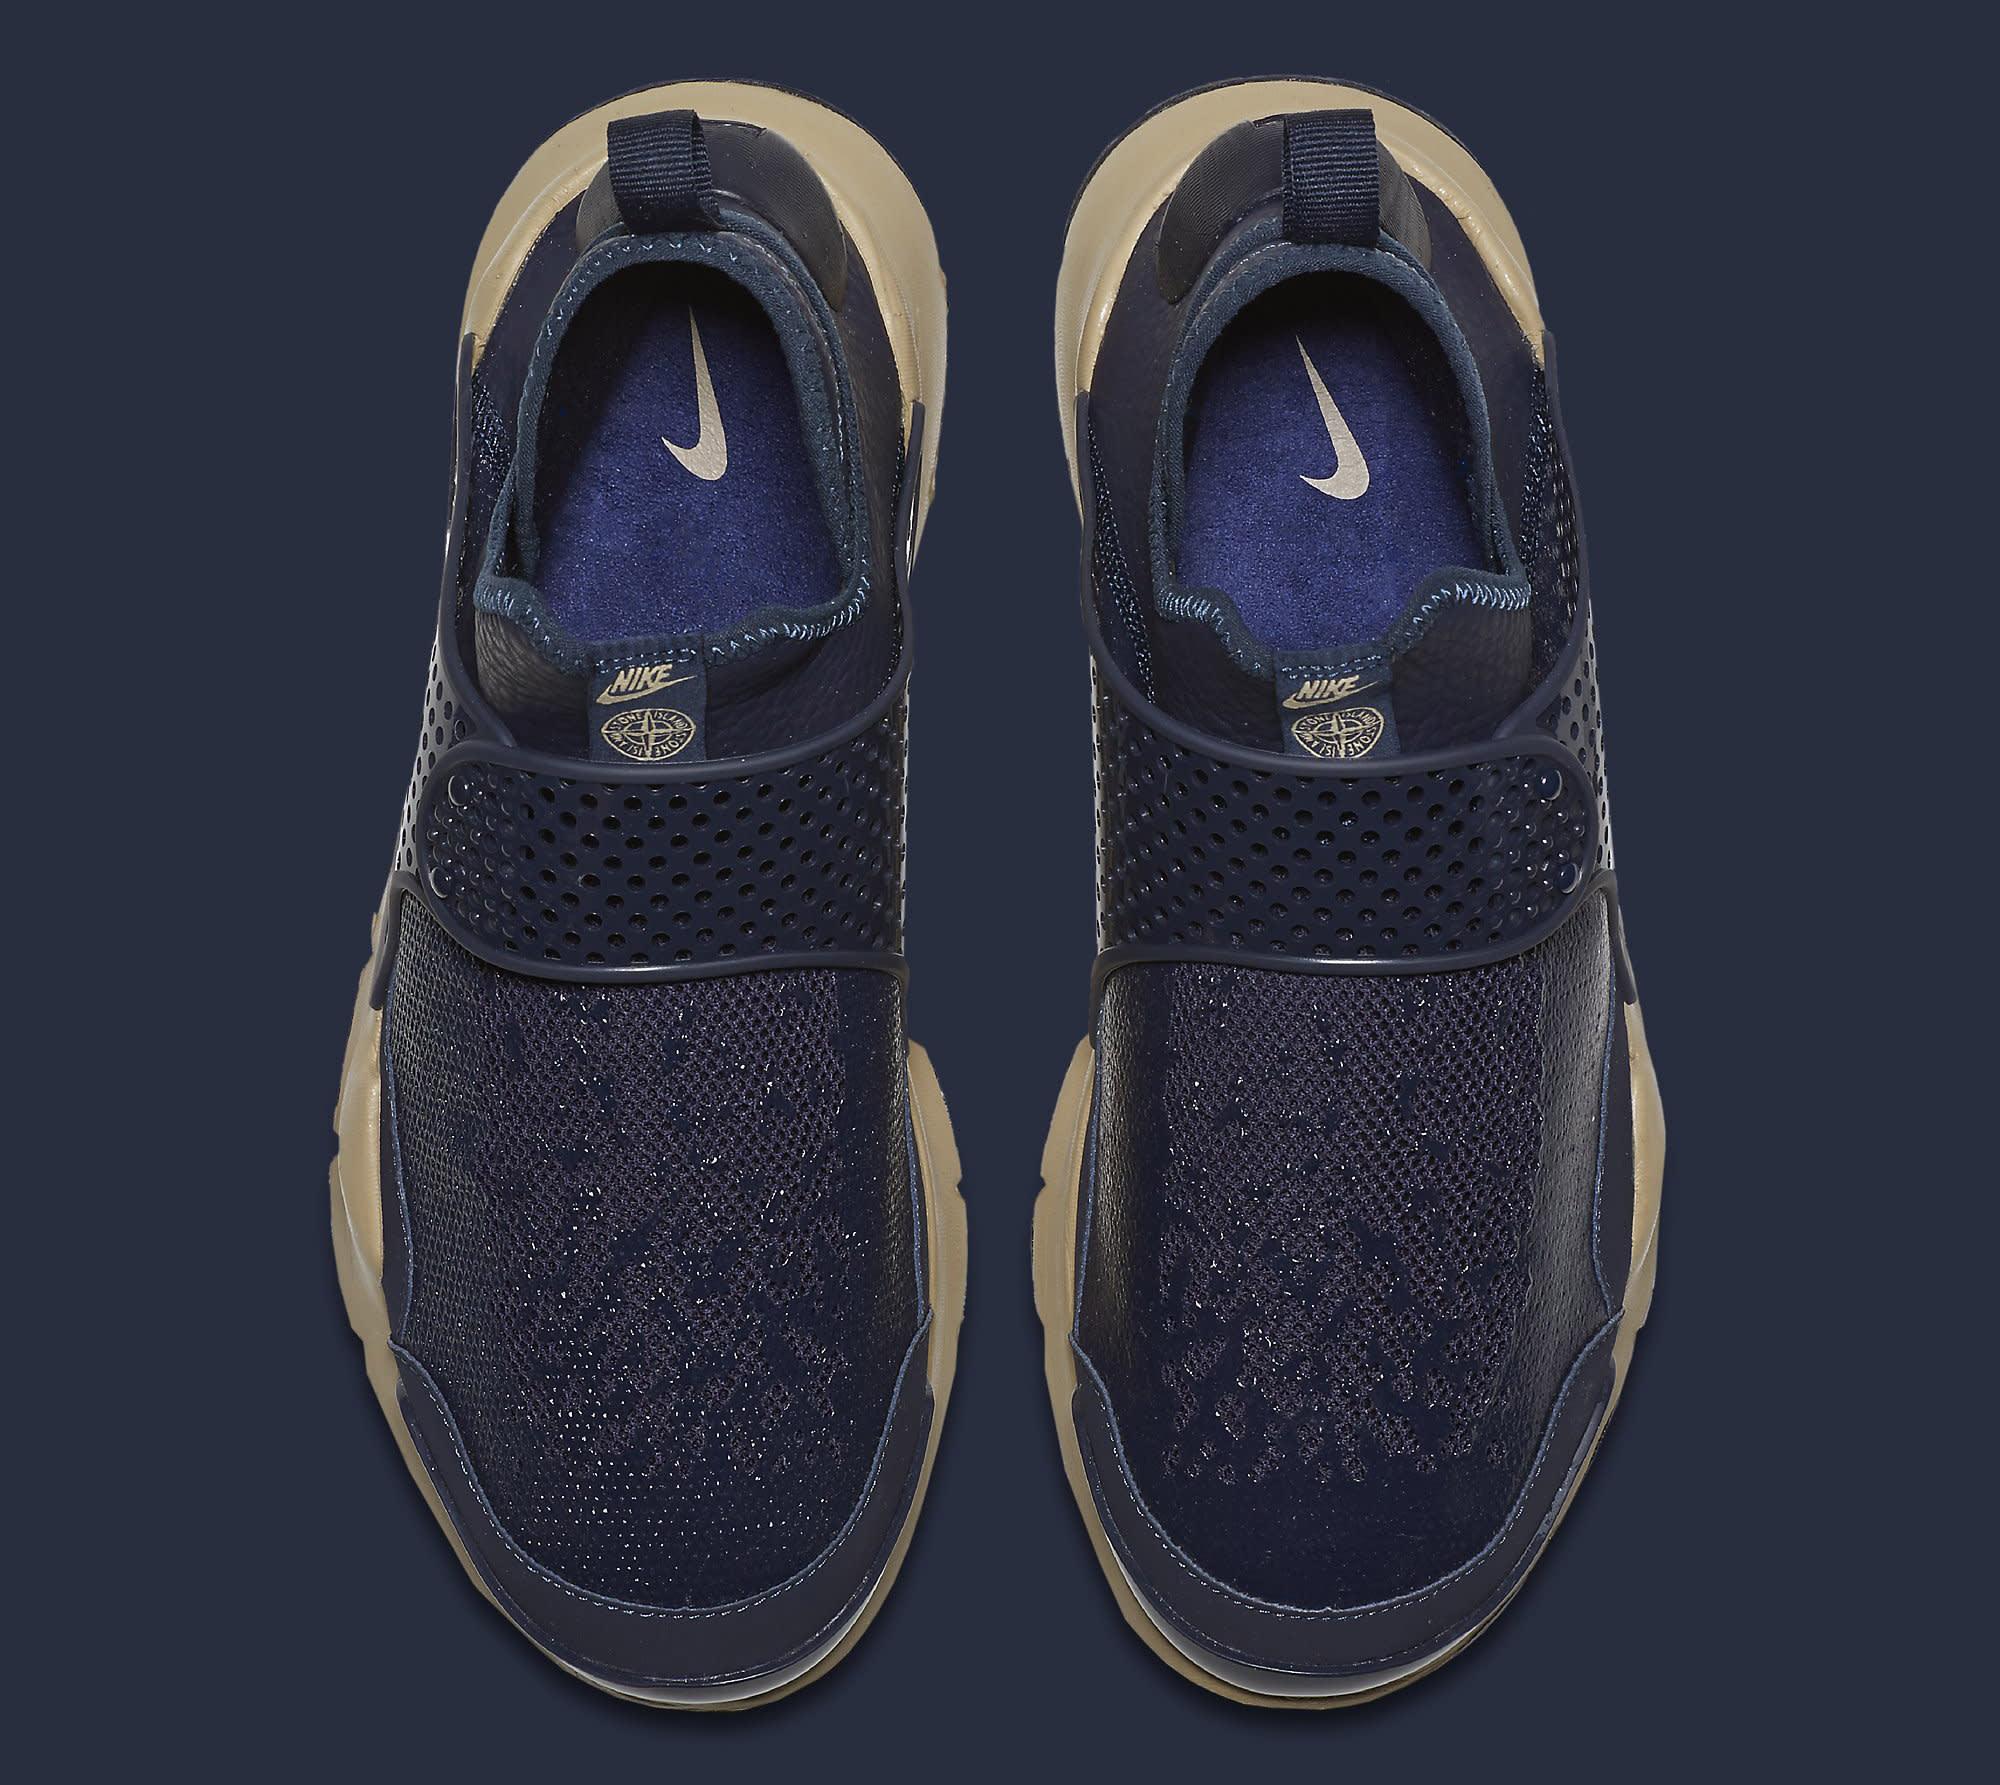 Stone Island Nike Sock Dart 910090-400 Top